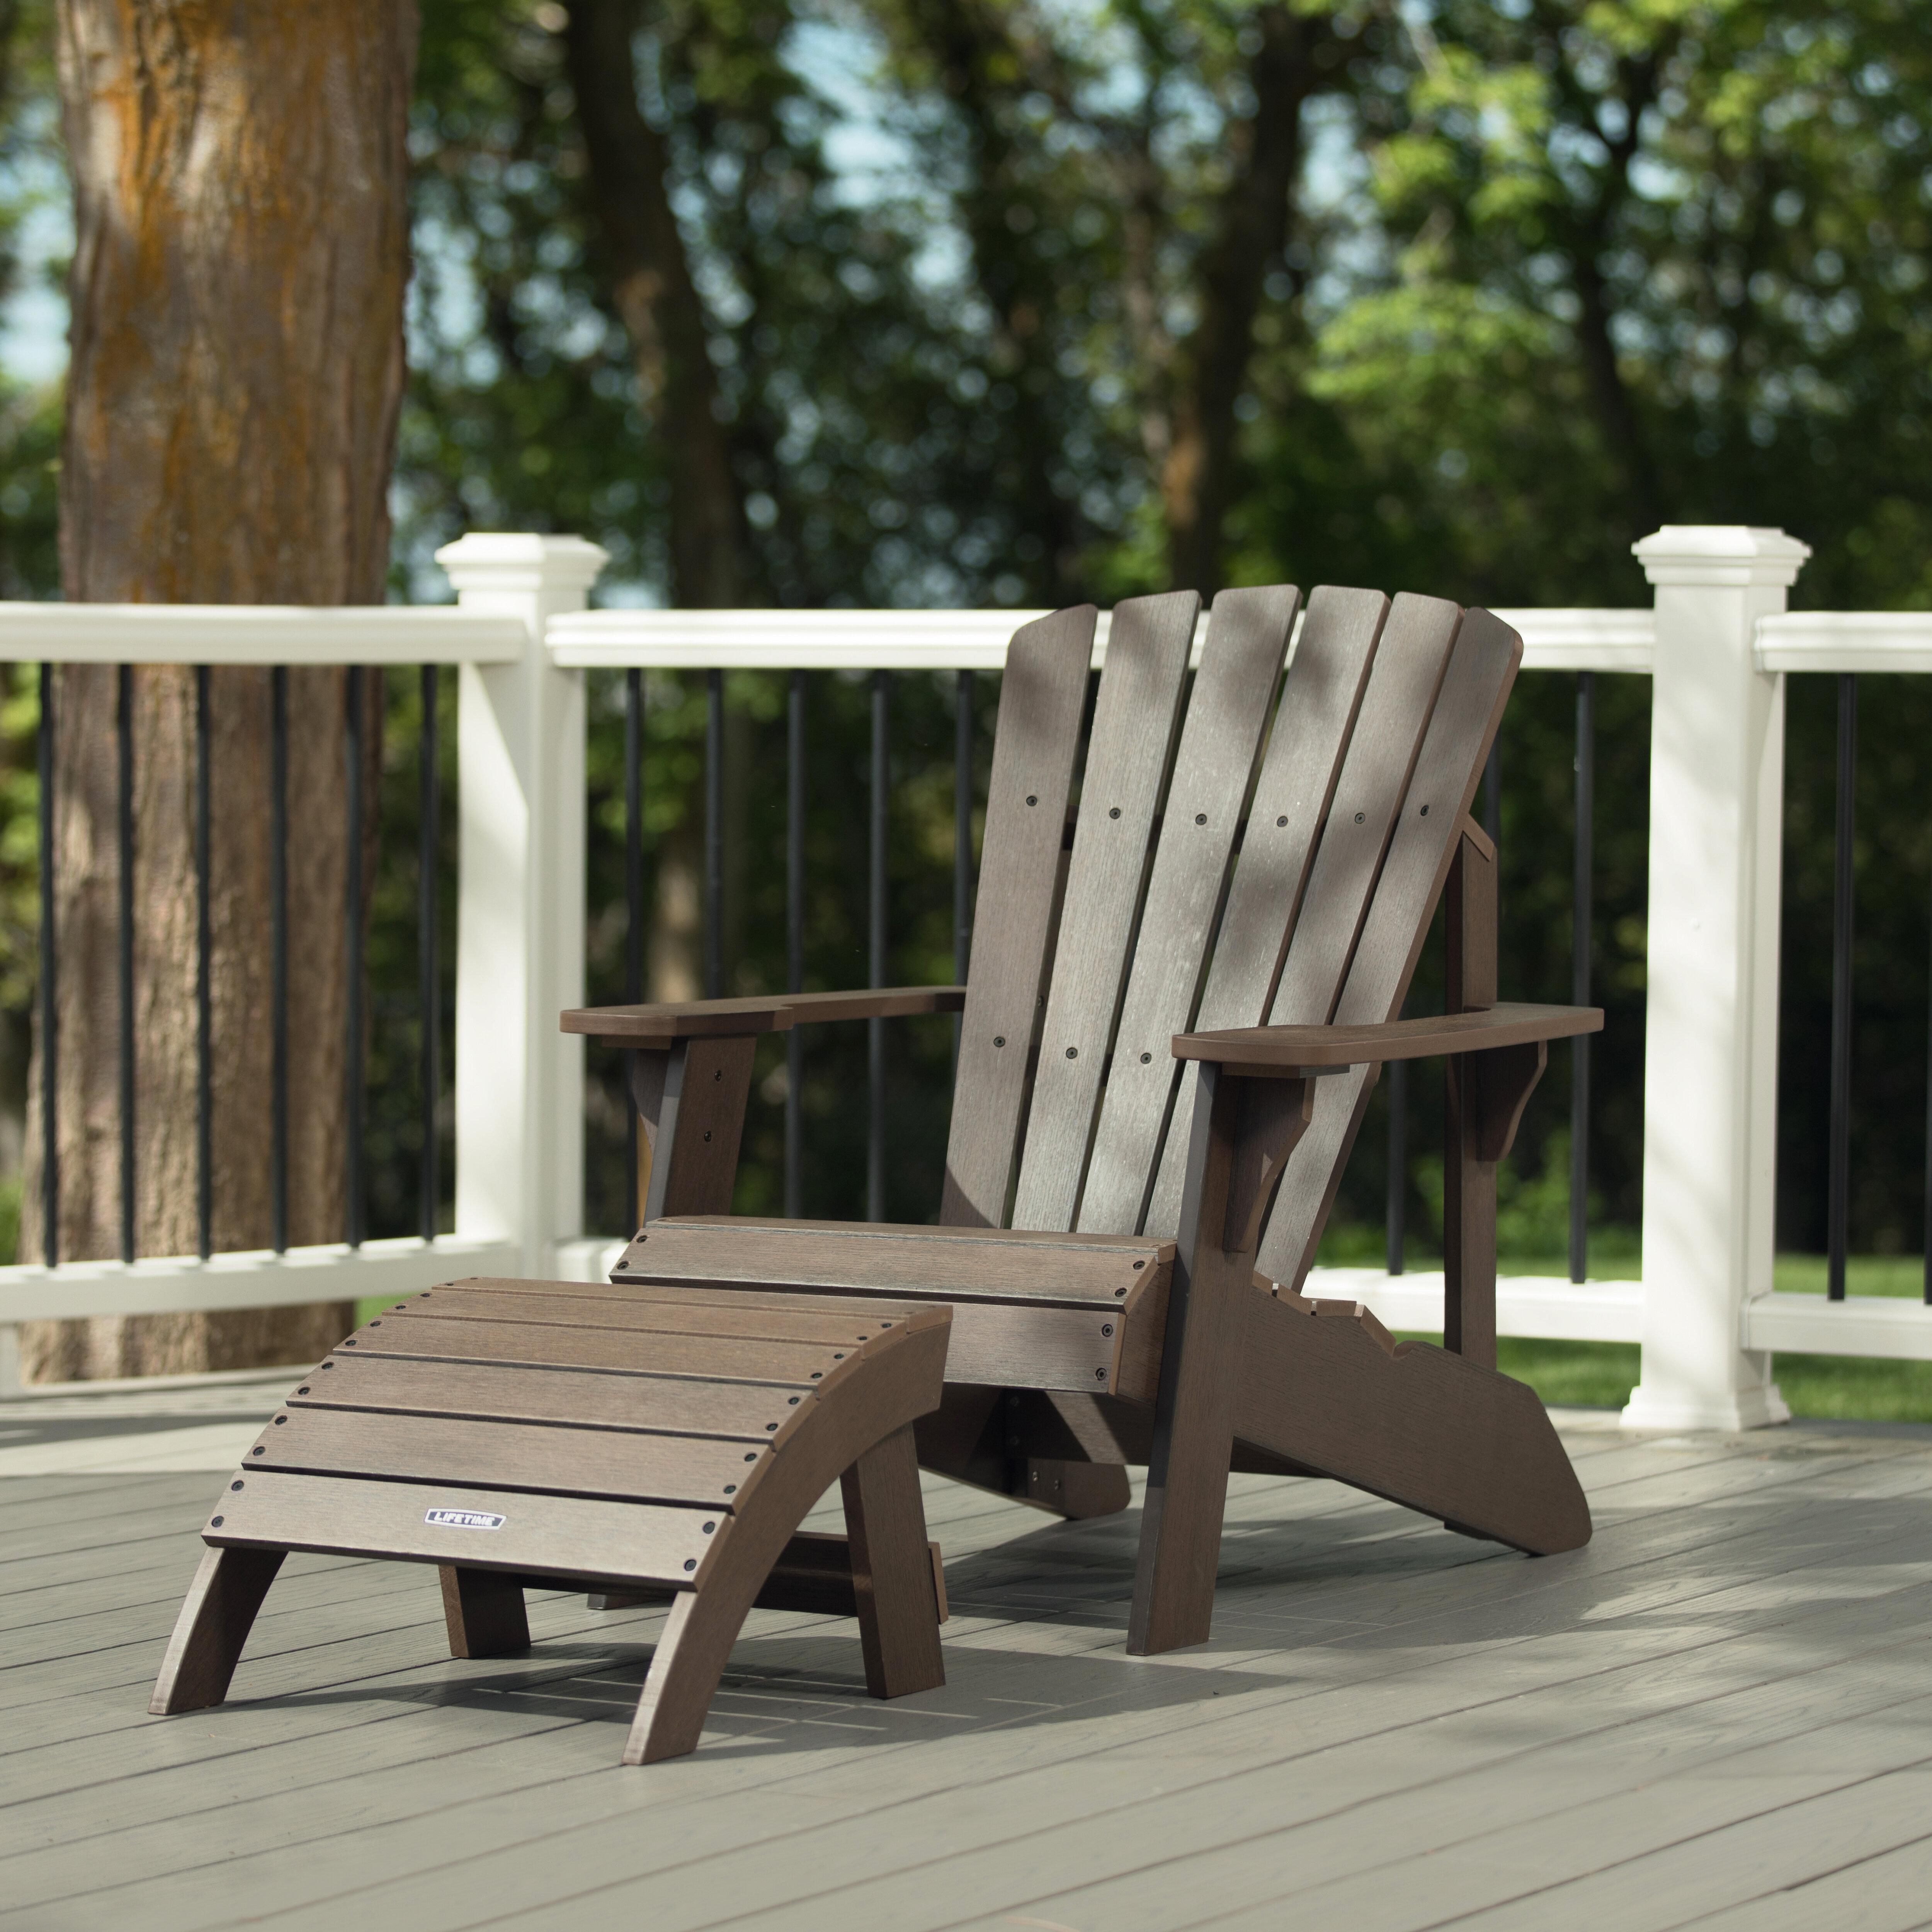 Plastic Adirondack Chairs With Ottoman.Plastic Resin Adirondack Chair With Ottoman